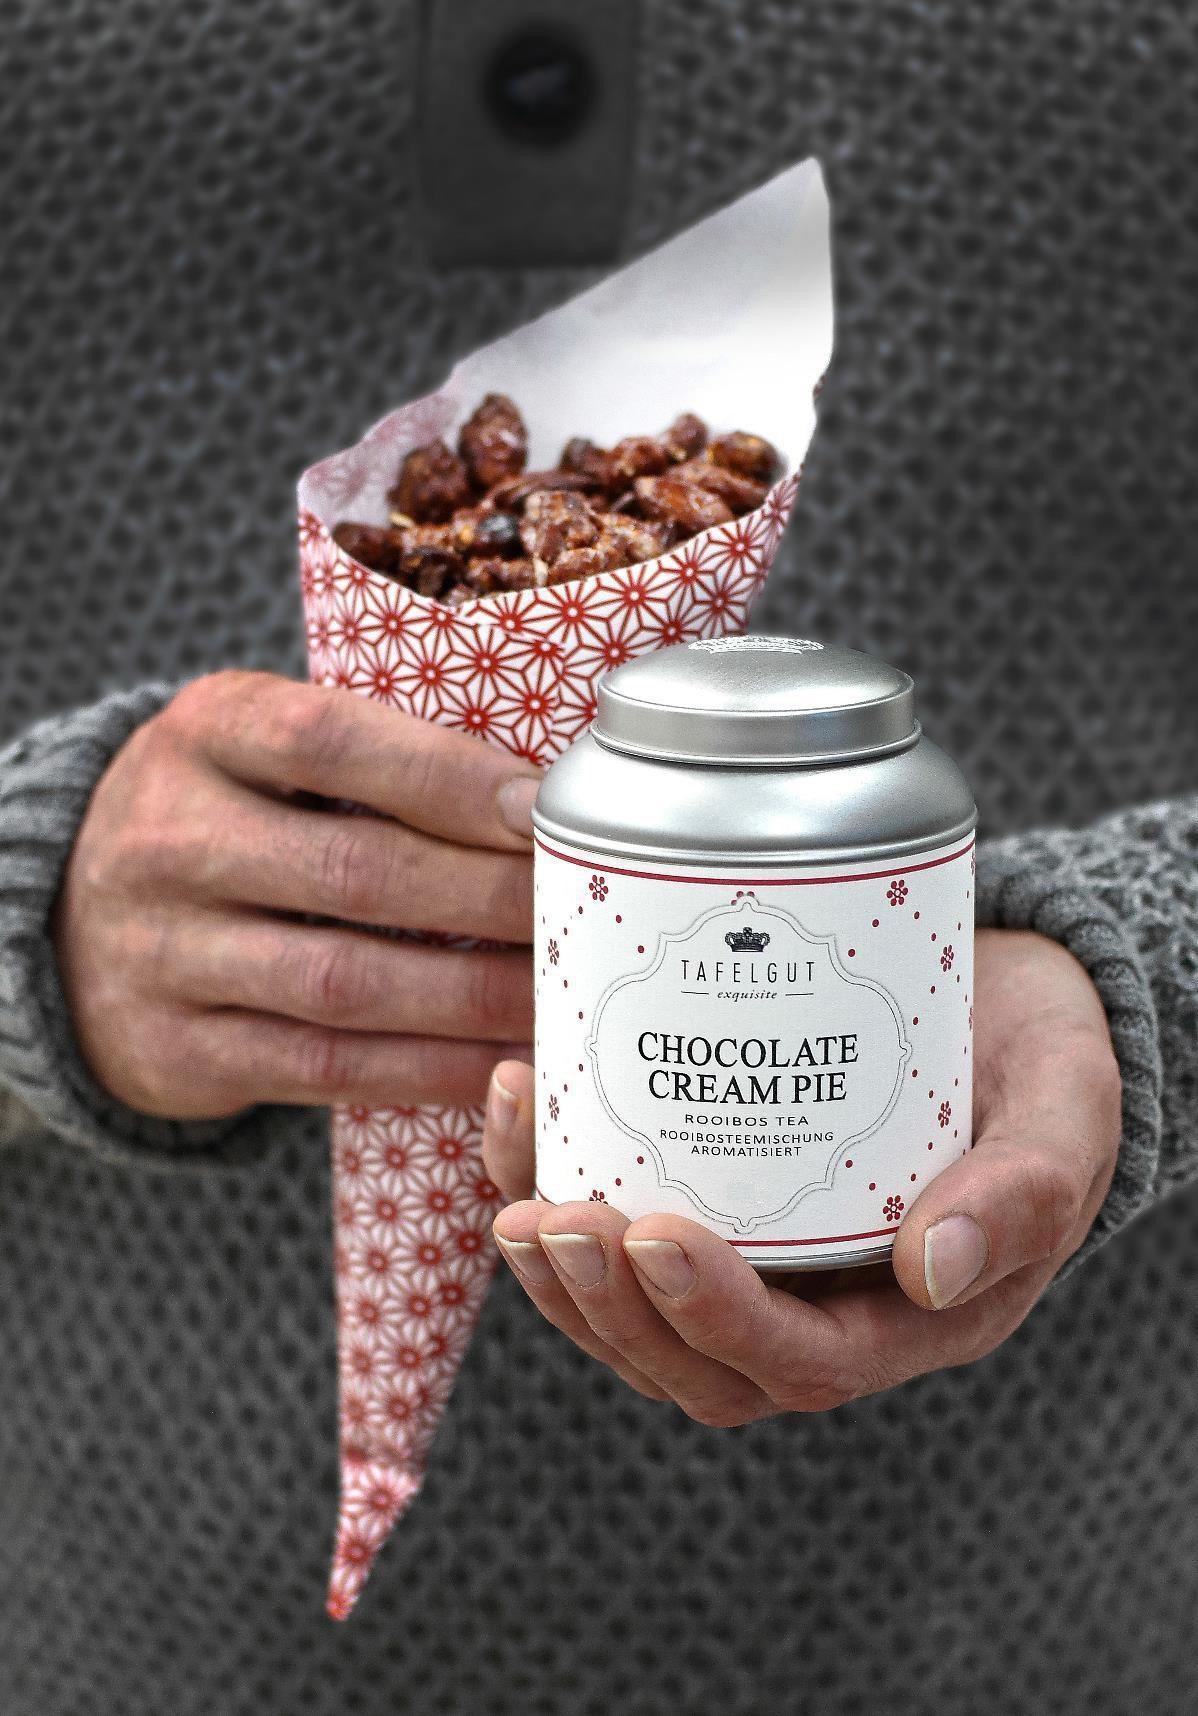 TAFELGUT Mini roobios čaj Chocolate cream pie - 35 gr, červená barva, kov